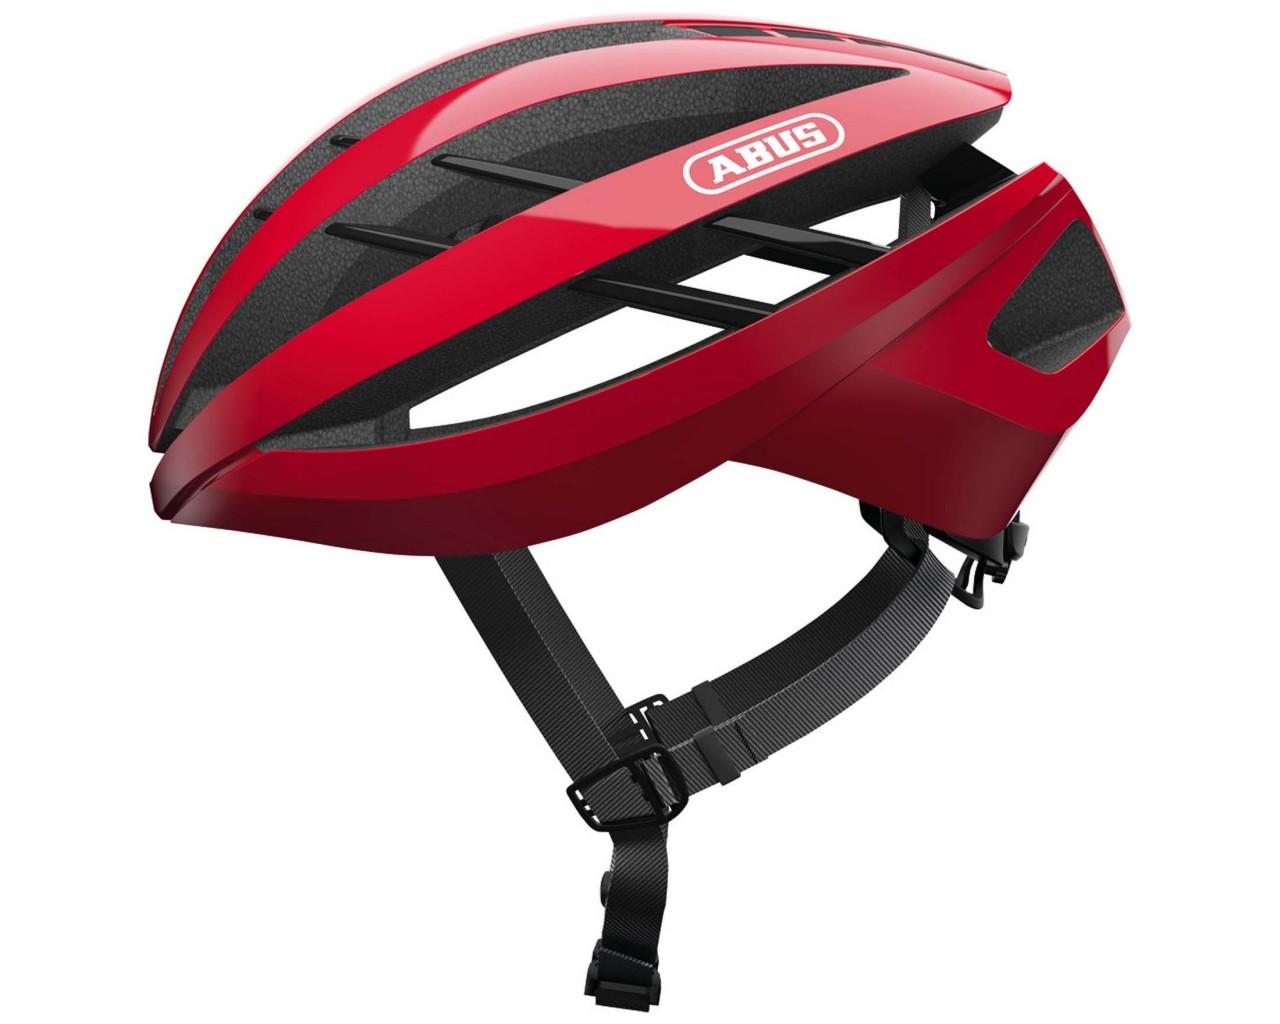 Abus Aventor Rennrad Fahrradhelm | racing red